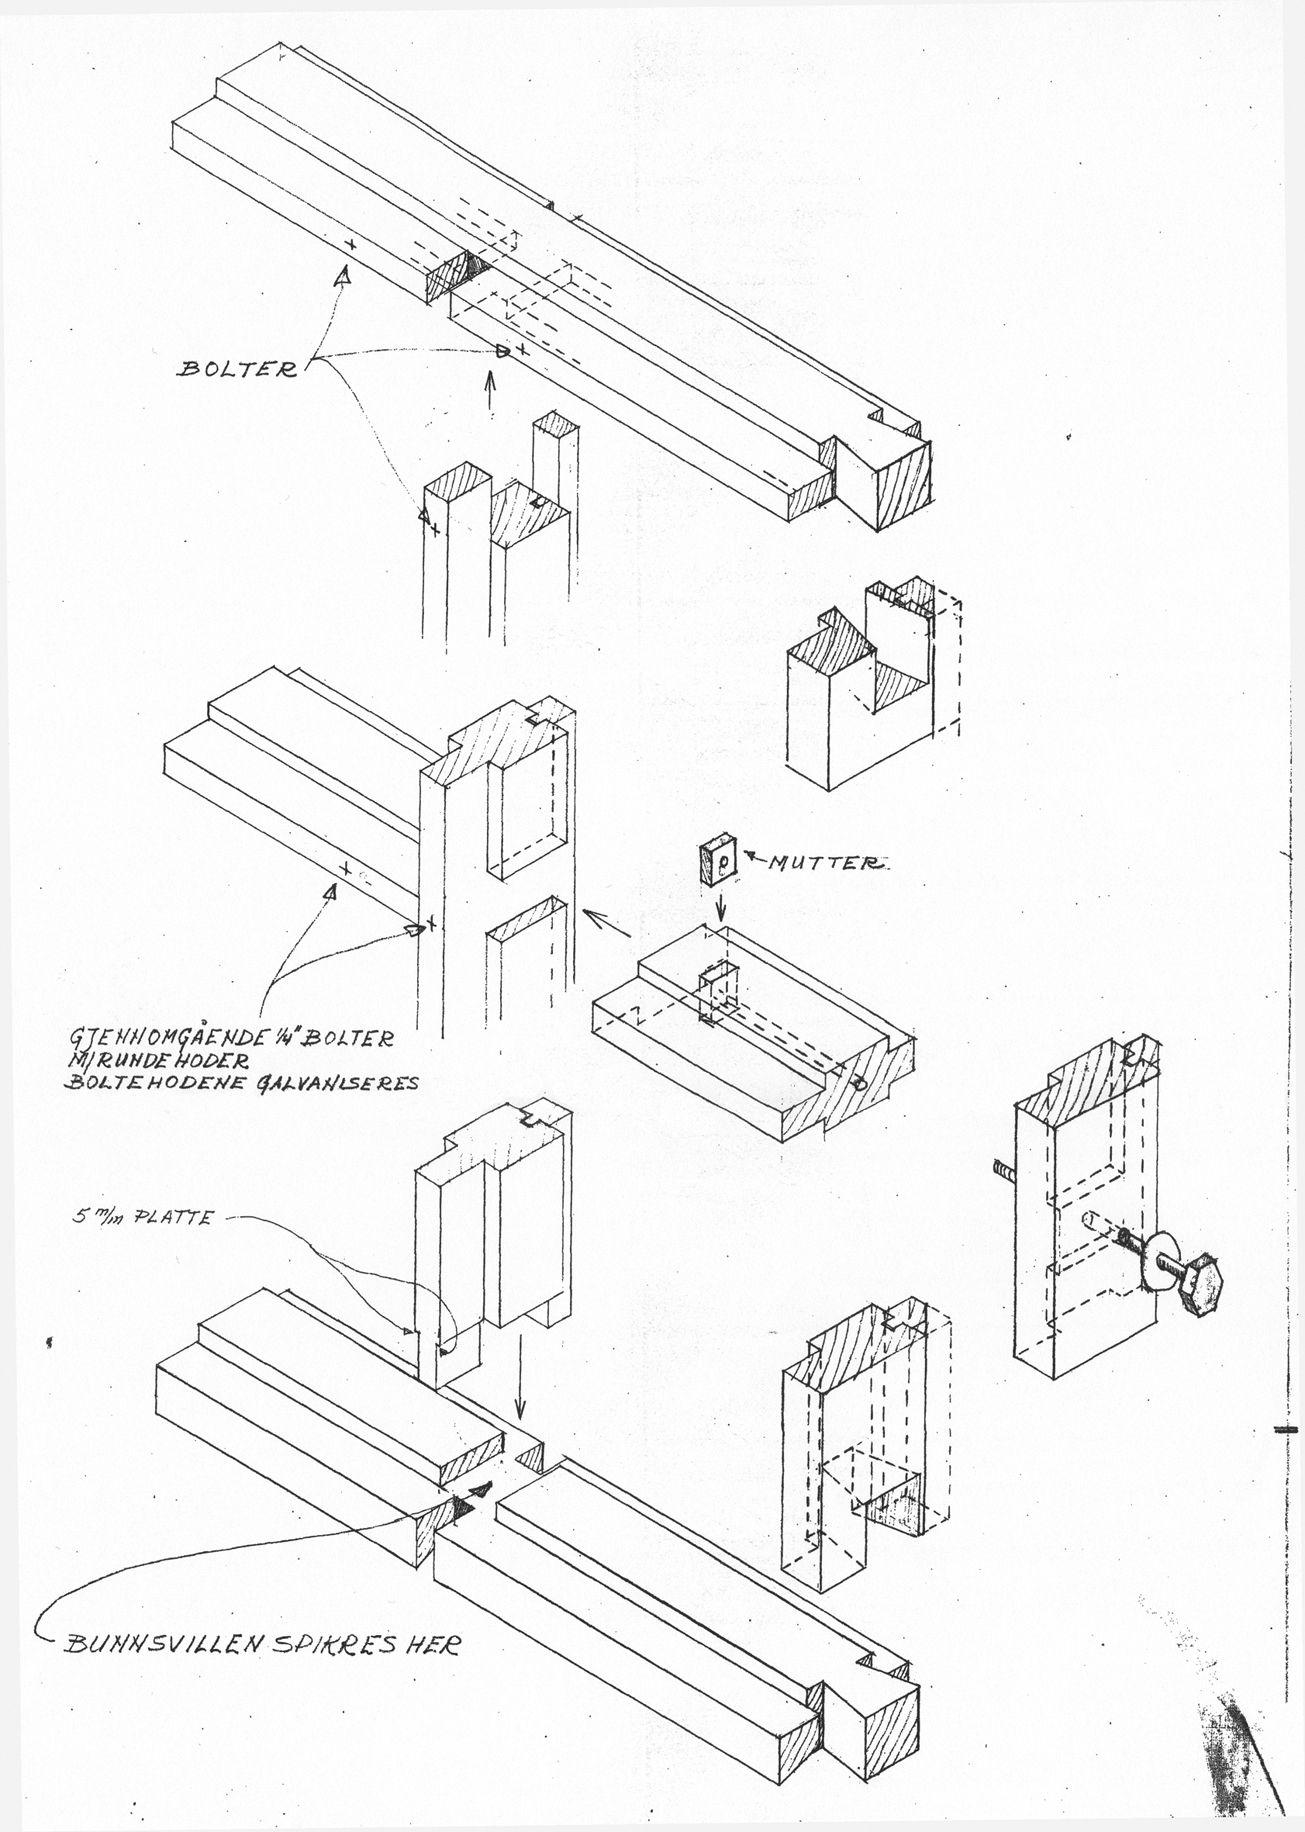 wood door frame diagram wiring diagram databaseresidential framing diagram  wiring diagram database interior door framing diagram